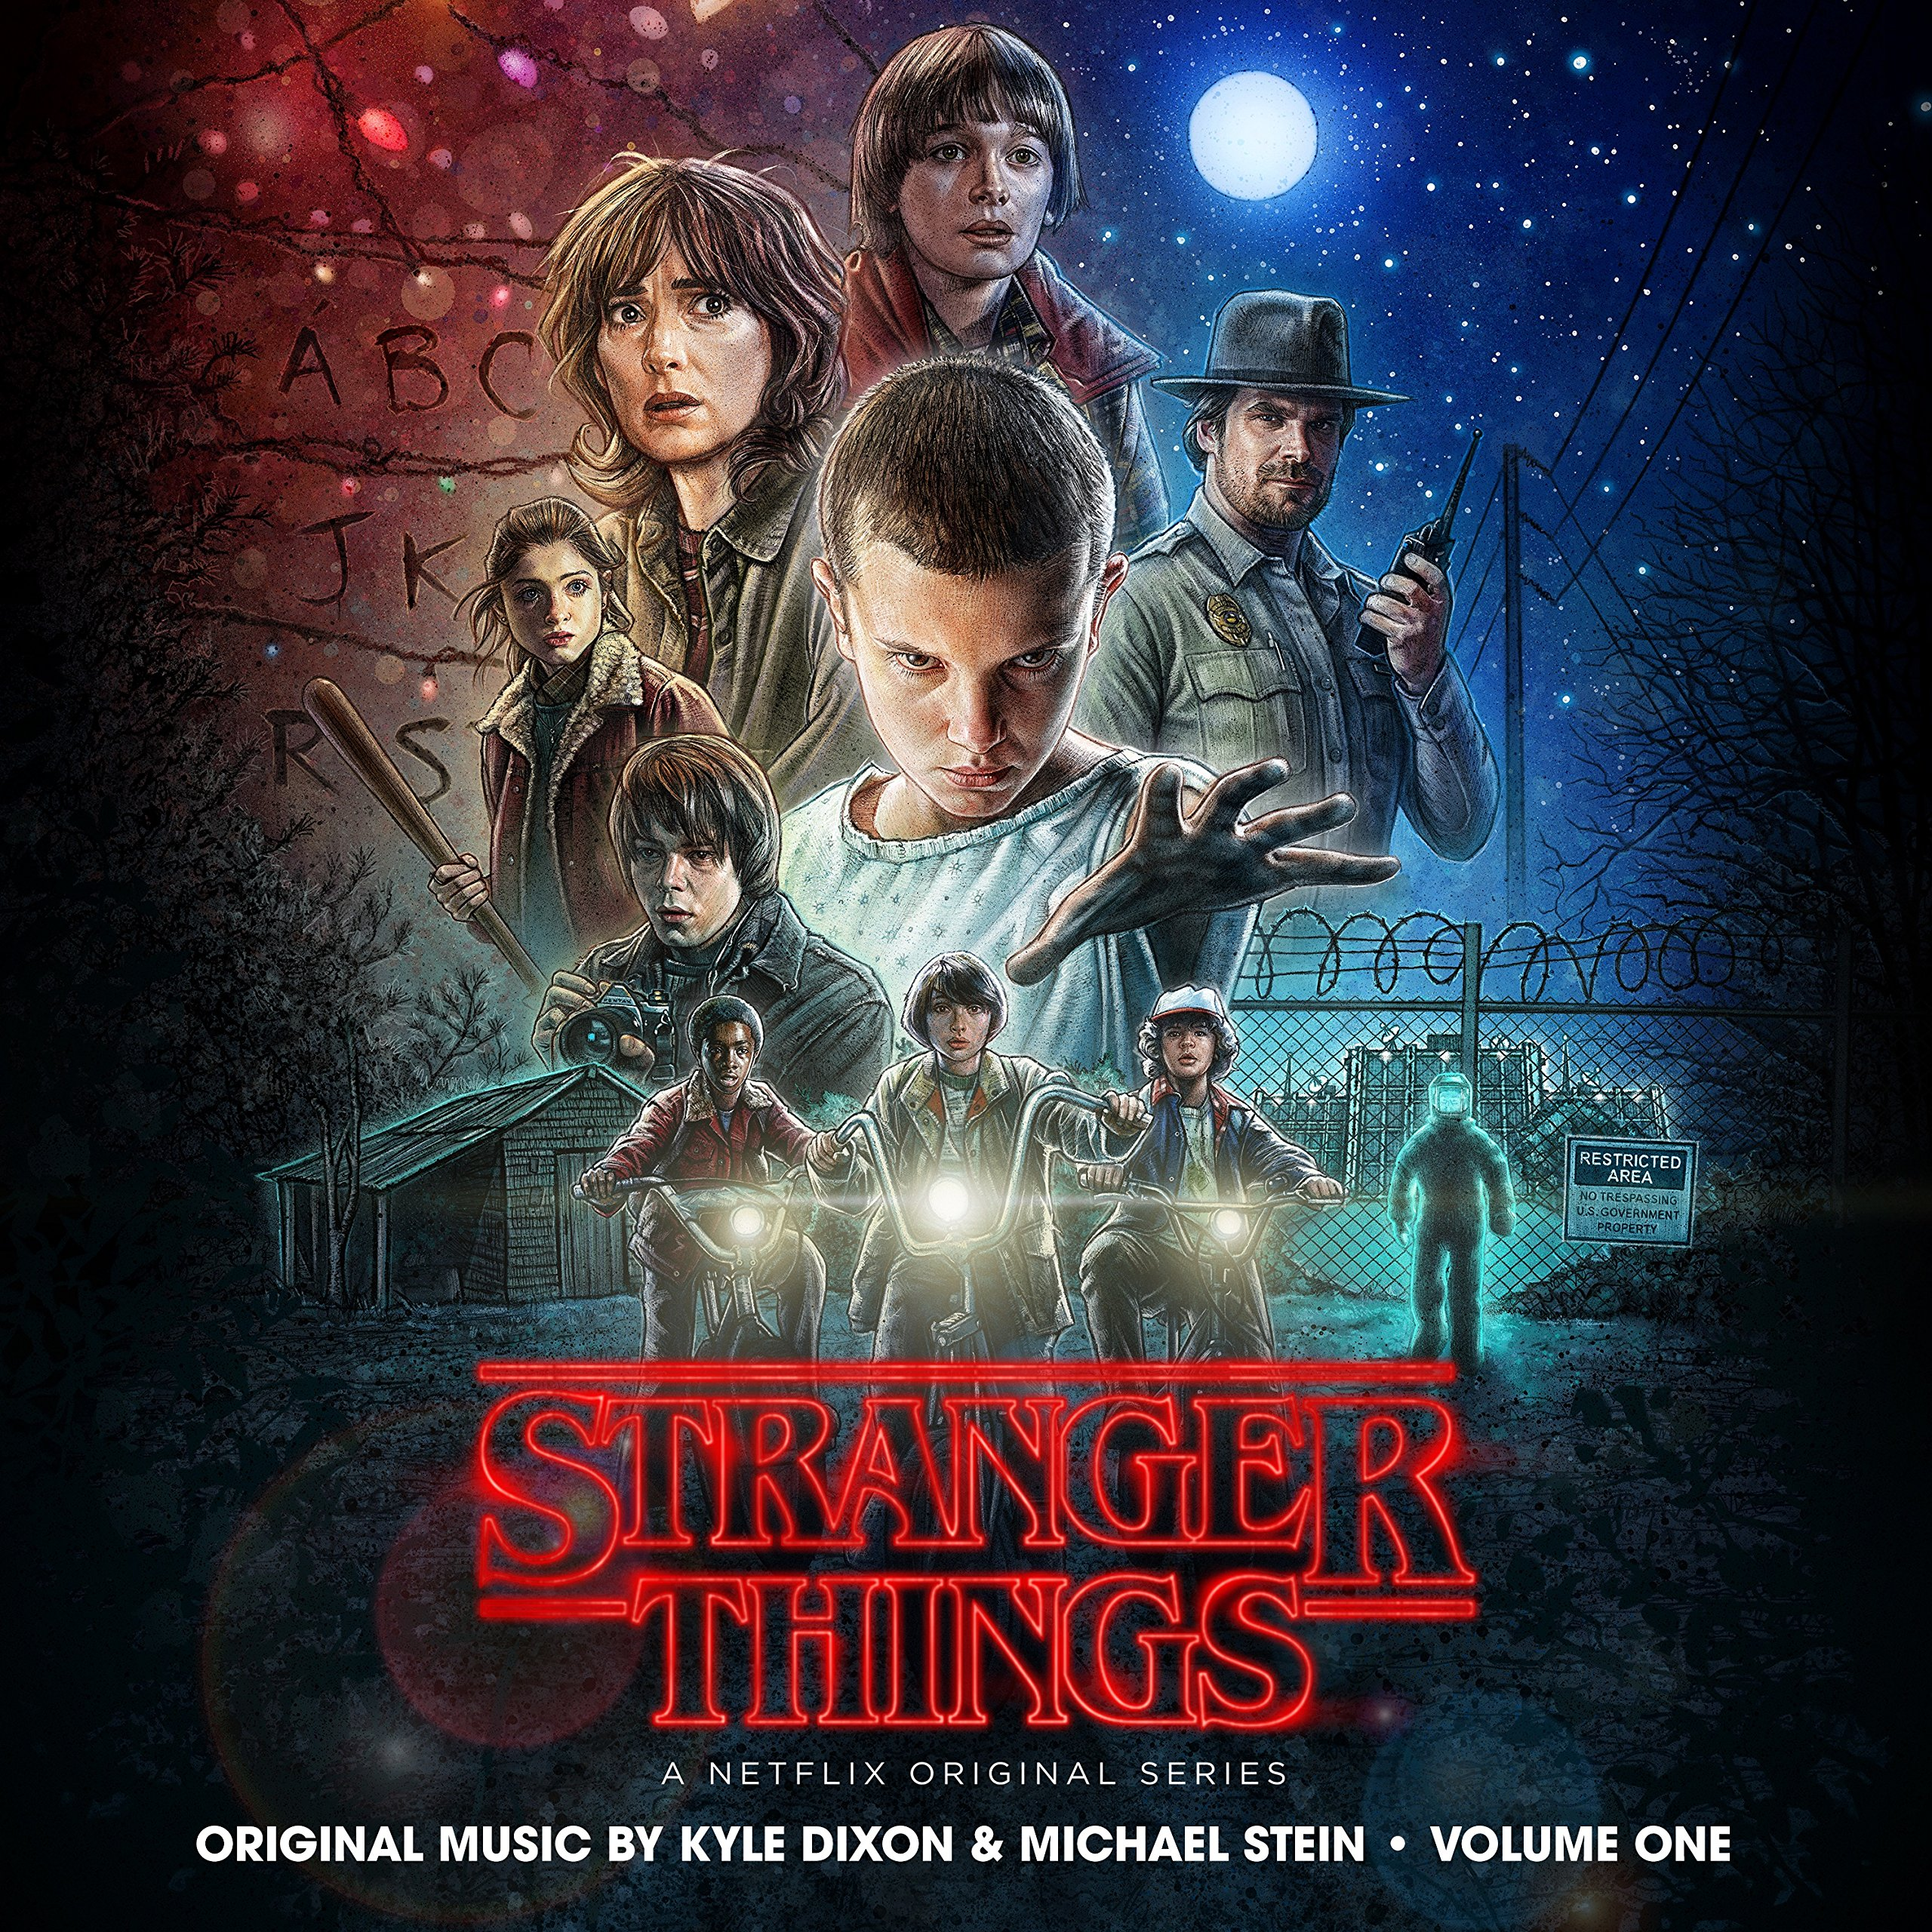 Stranger Things, Vol. 1 (A Netflix Original Series Soundtrack) by LAKESHORE/STRANGER THINGS